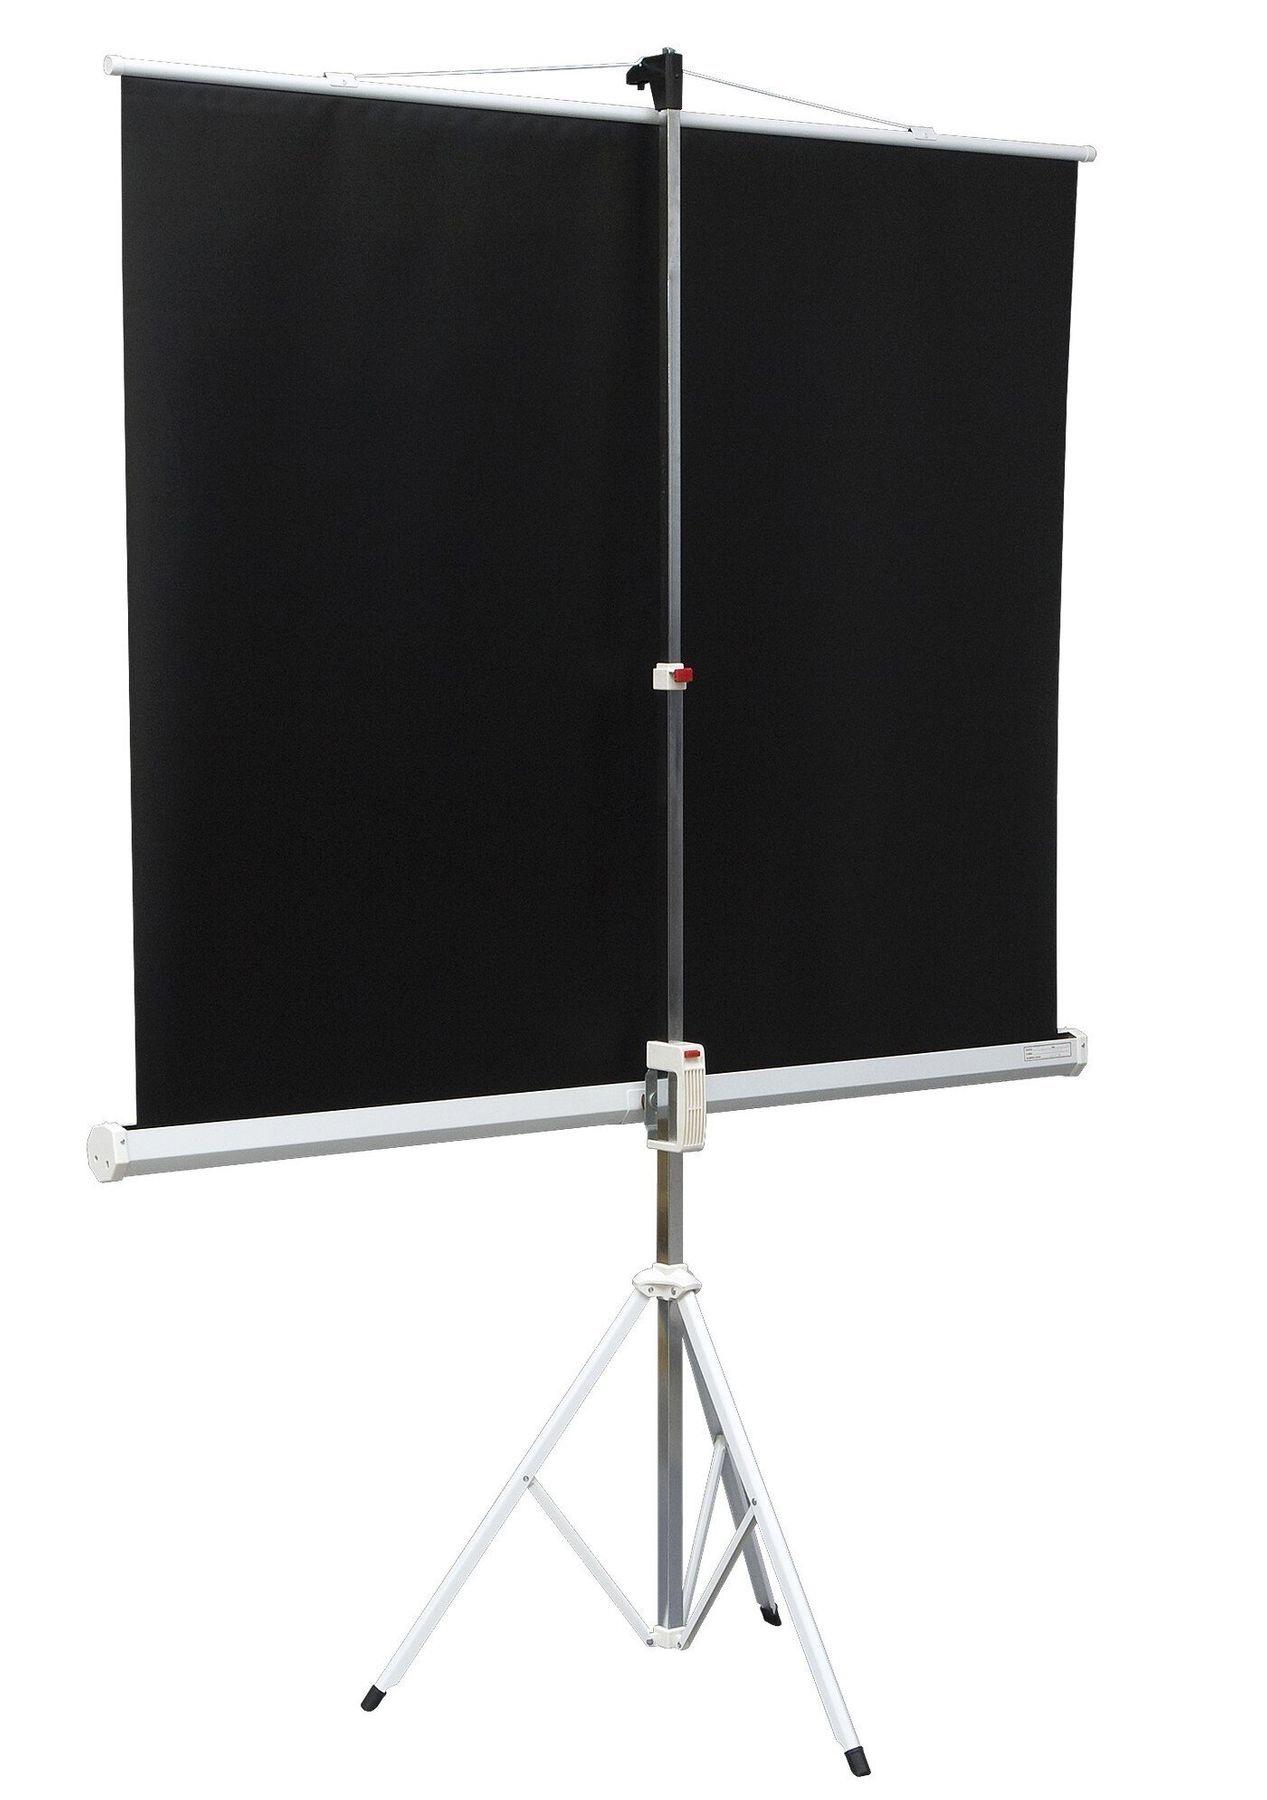 Экран для проектора Profi Mobile на треноге, 124х124см. 2x3 - фото 3